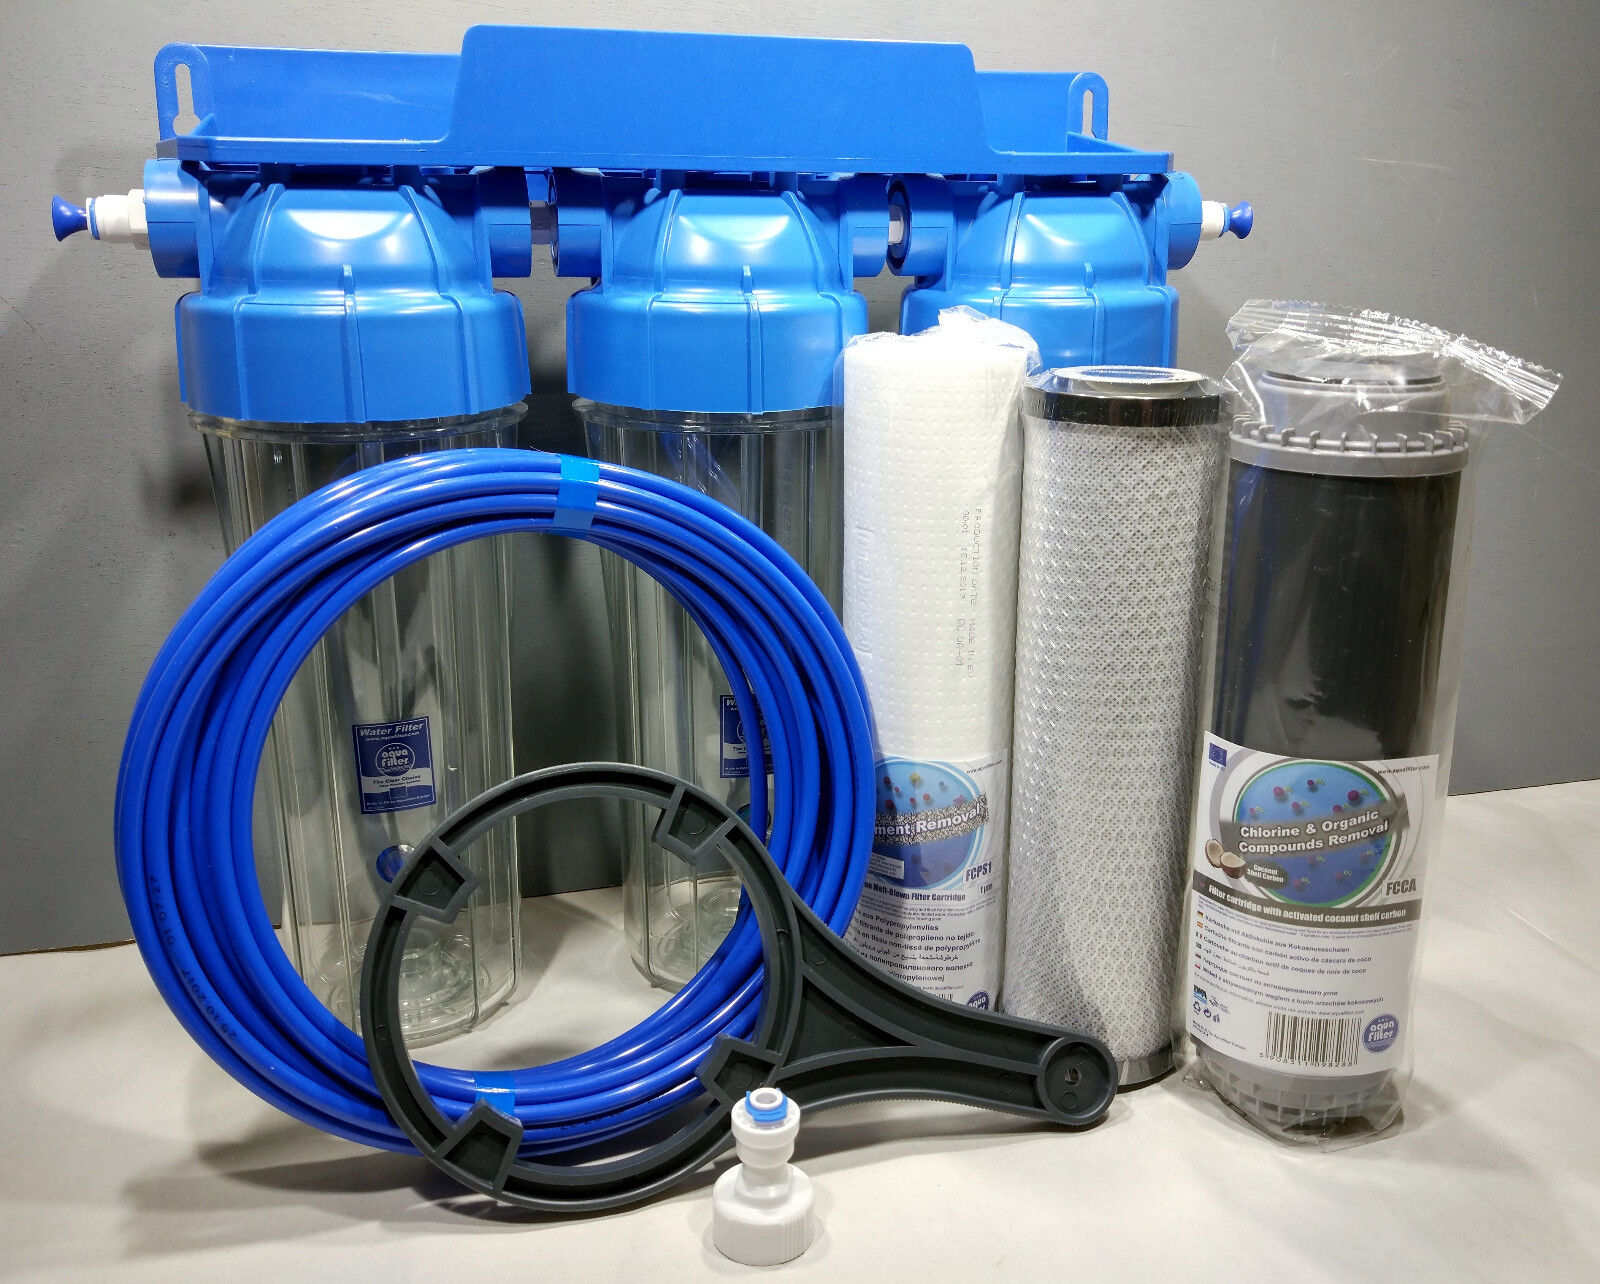 3 Fasi HMA DEPURATORE Koi Laghetti & dechlorinator sistema di filtro